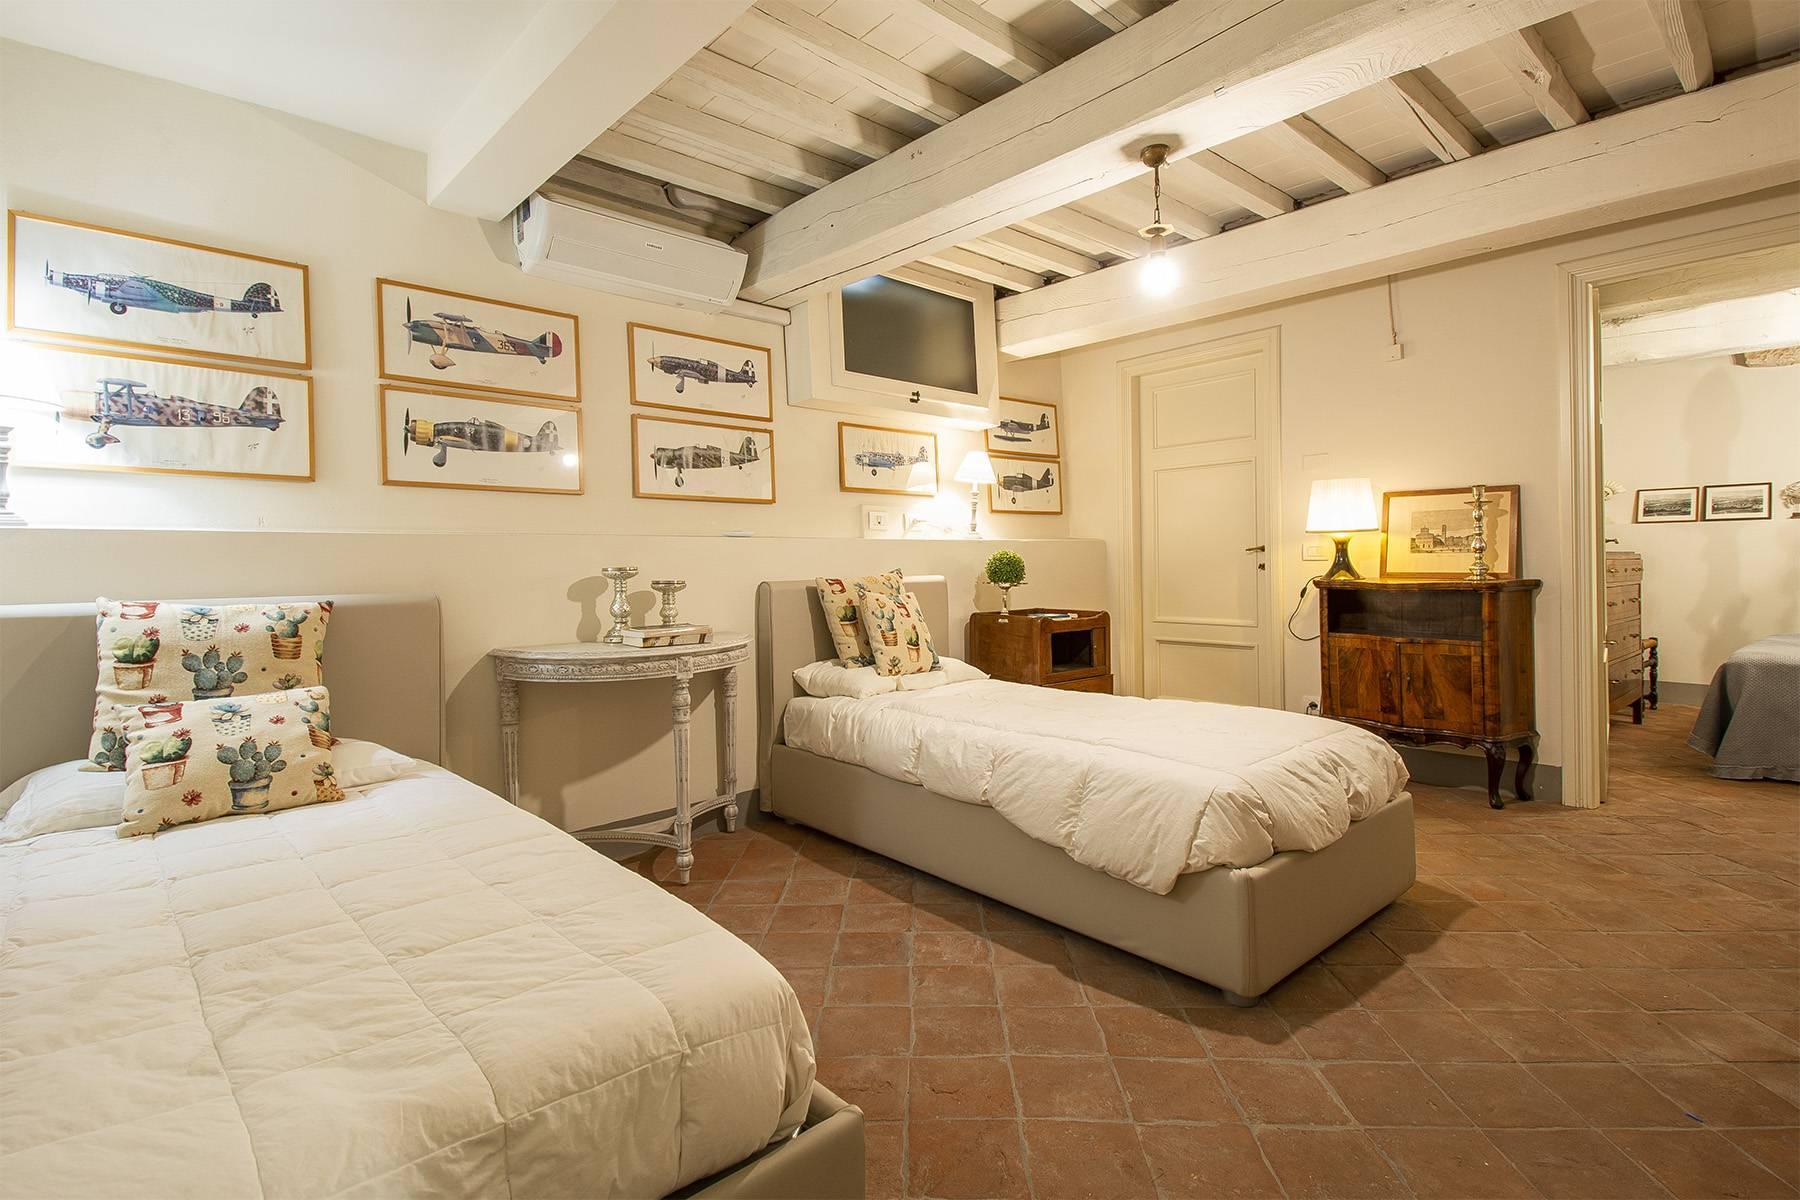 Appartement exclusif au coeur de Lucca - 25